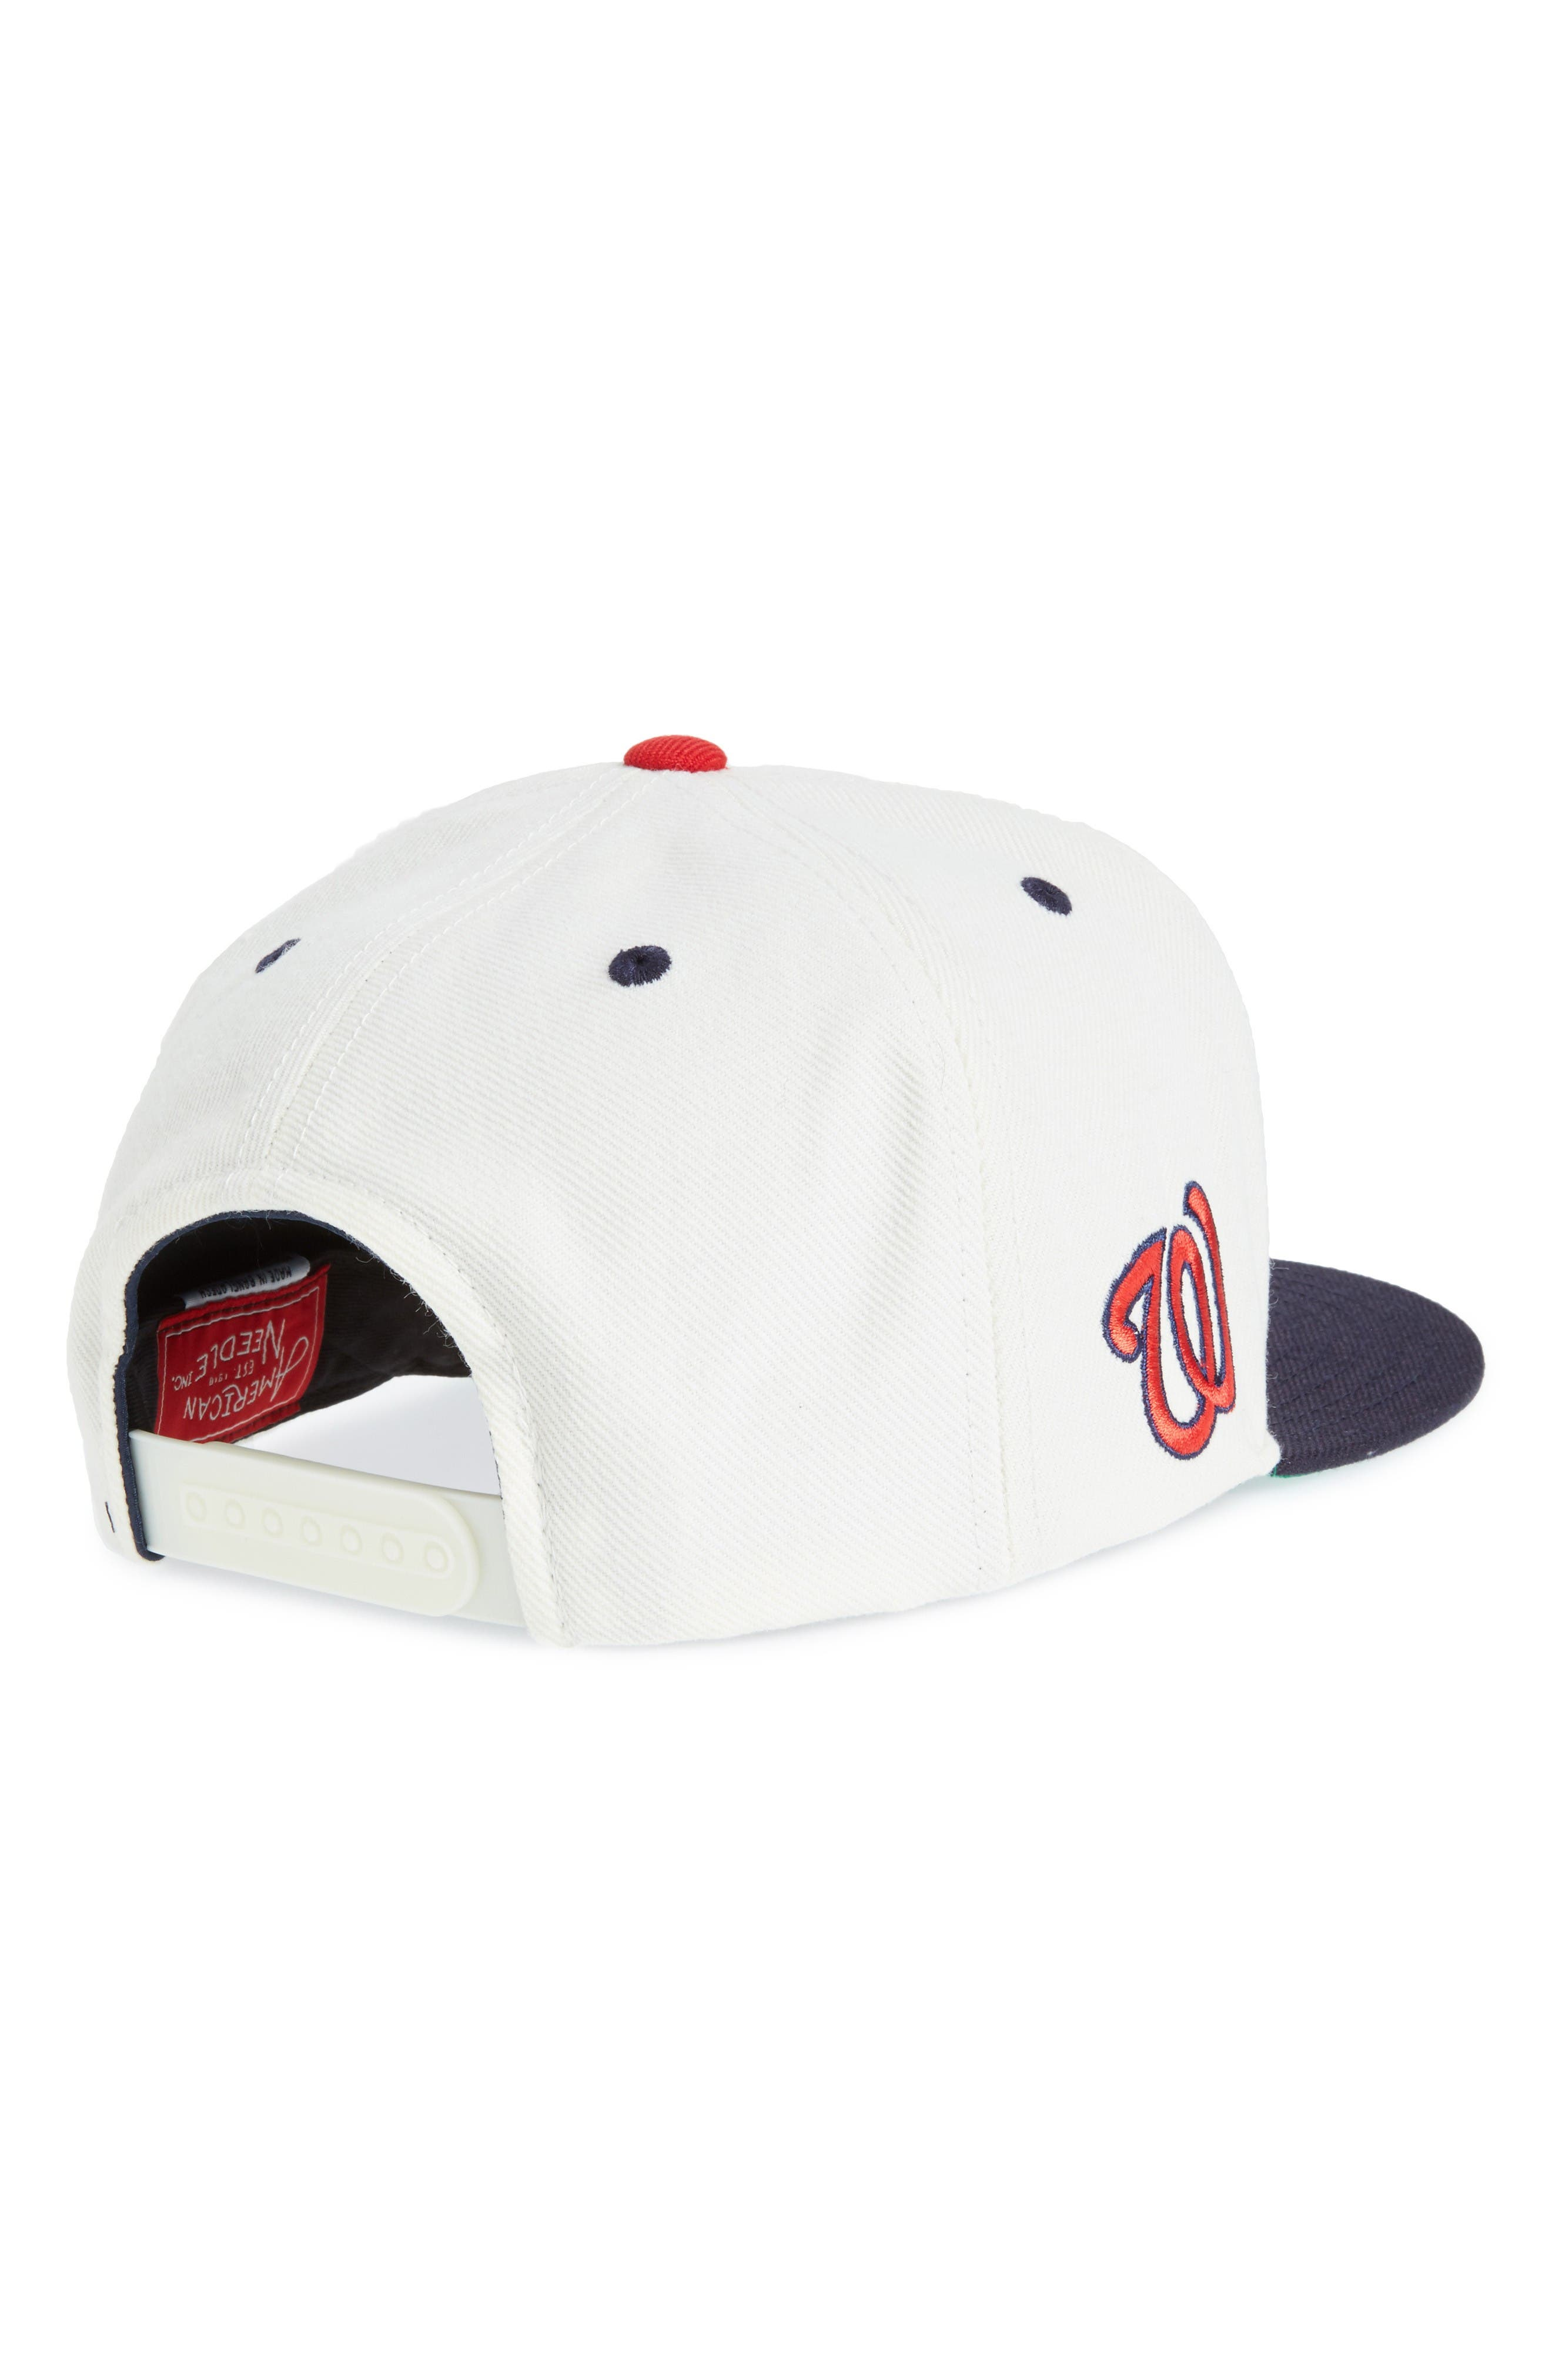 United MLB Snapback Baseball Cap,                             Alternate thumbnail 2, color,                             Nationals